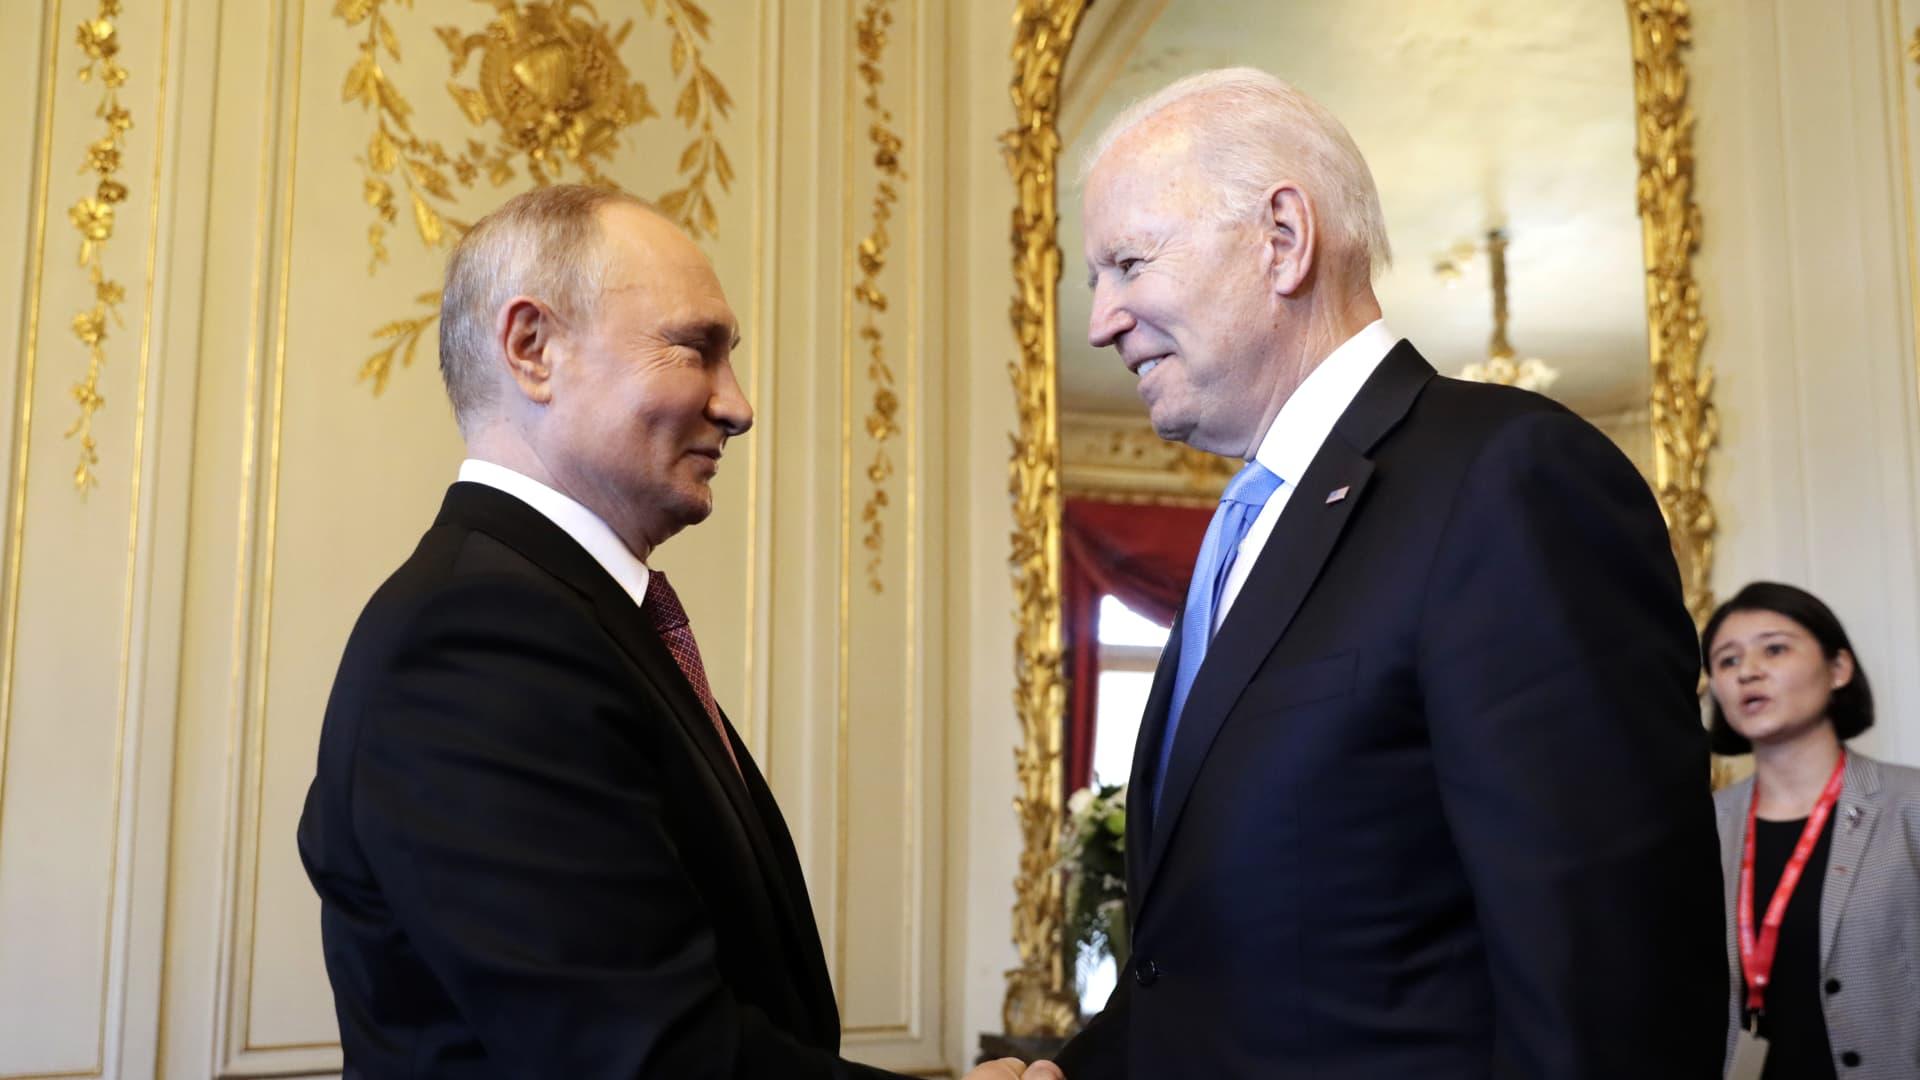 Russia's President Vladimir Putin (L) and US President Joe Biden shake hands as they meet for talks at the Villa La Grange.